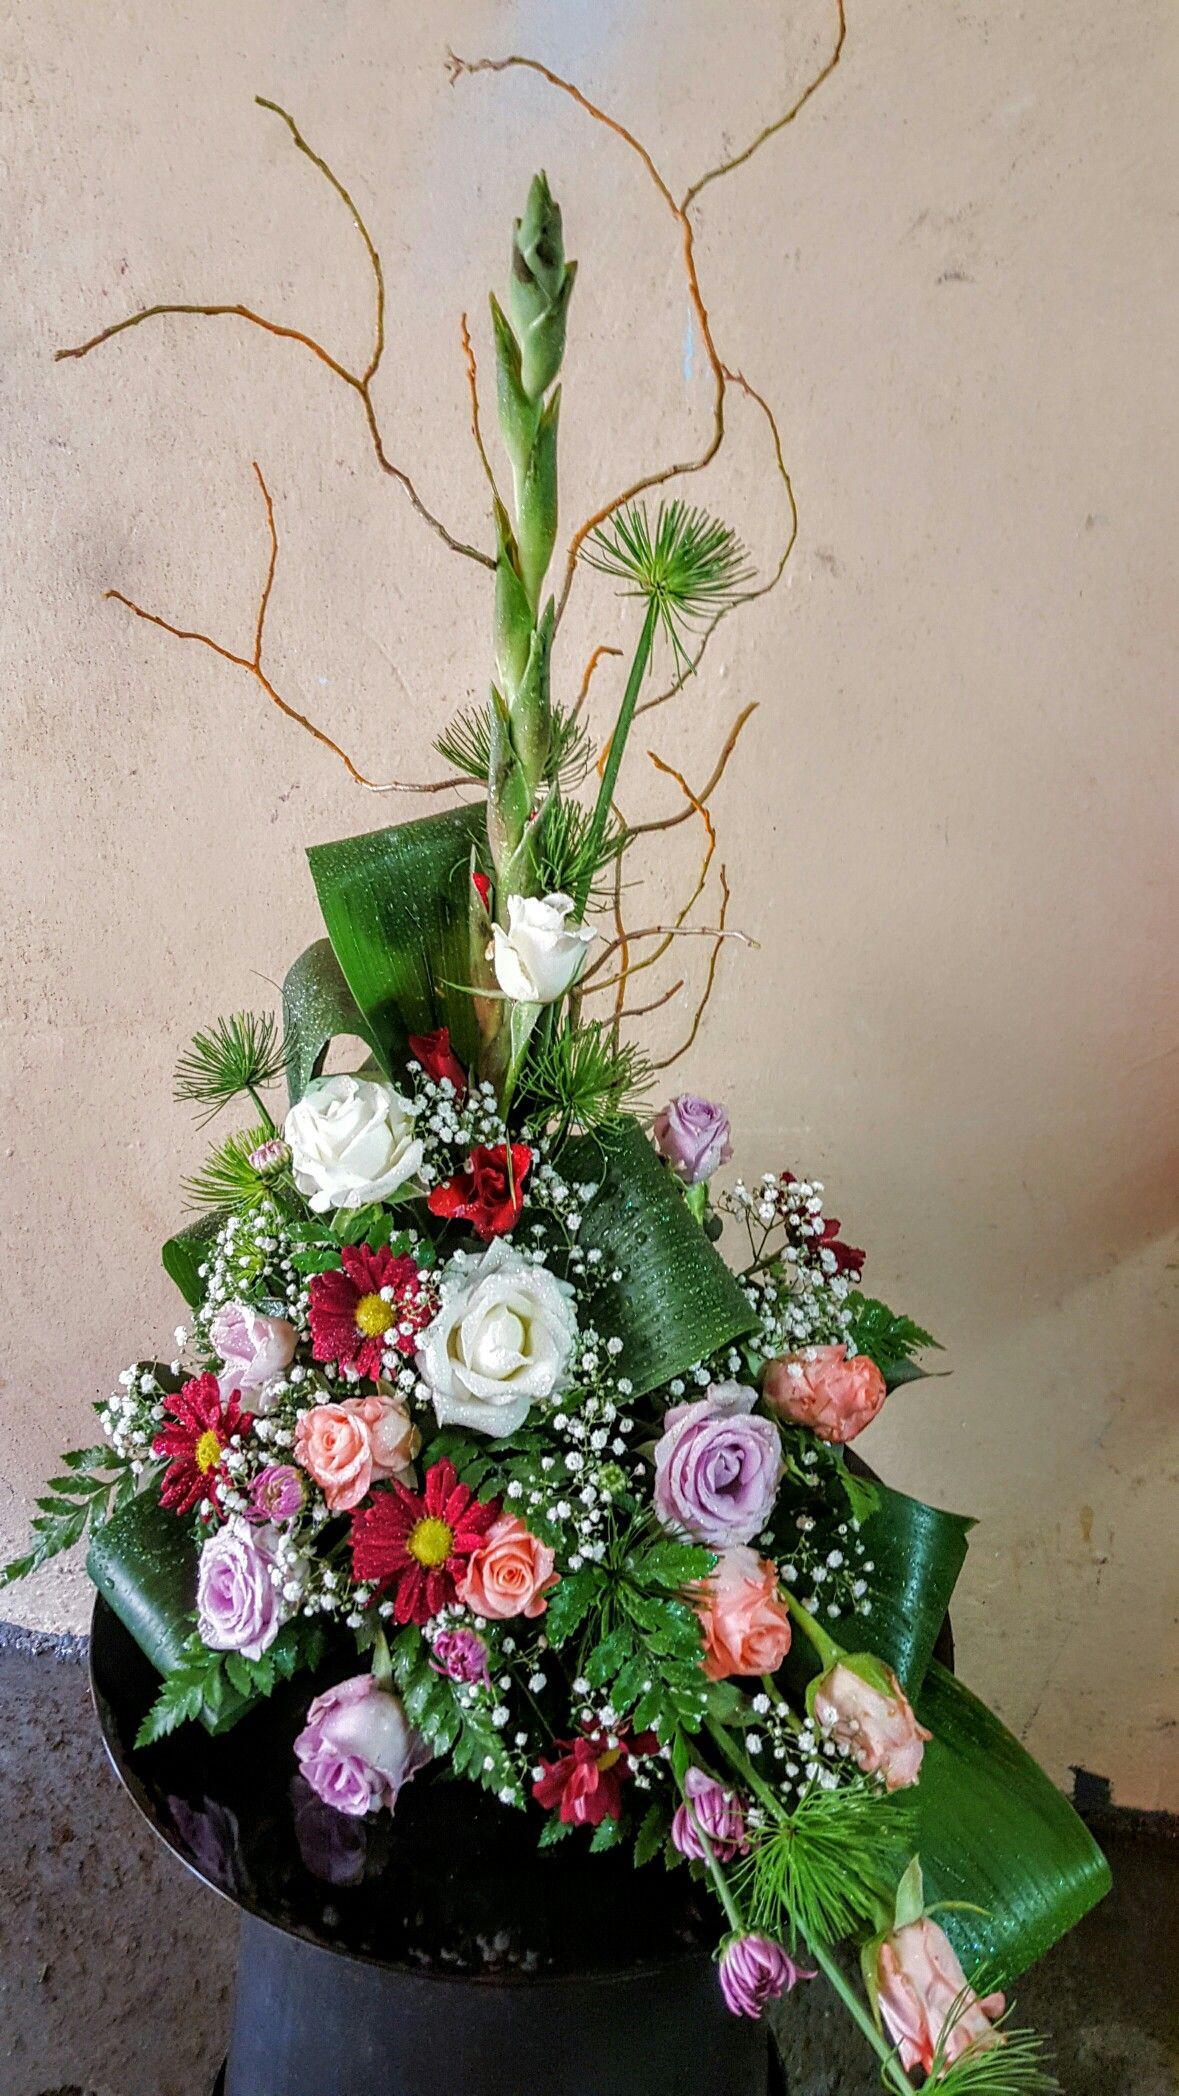 Explore Floral Arrangements Can and more